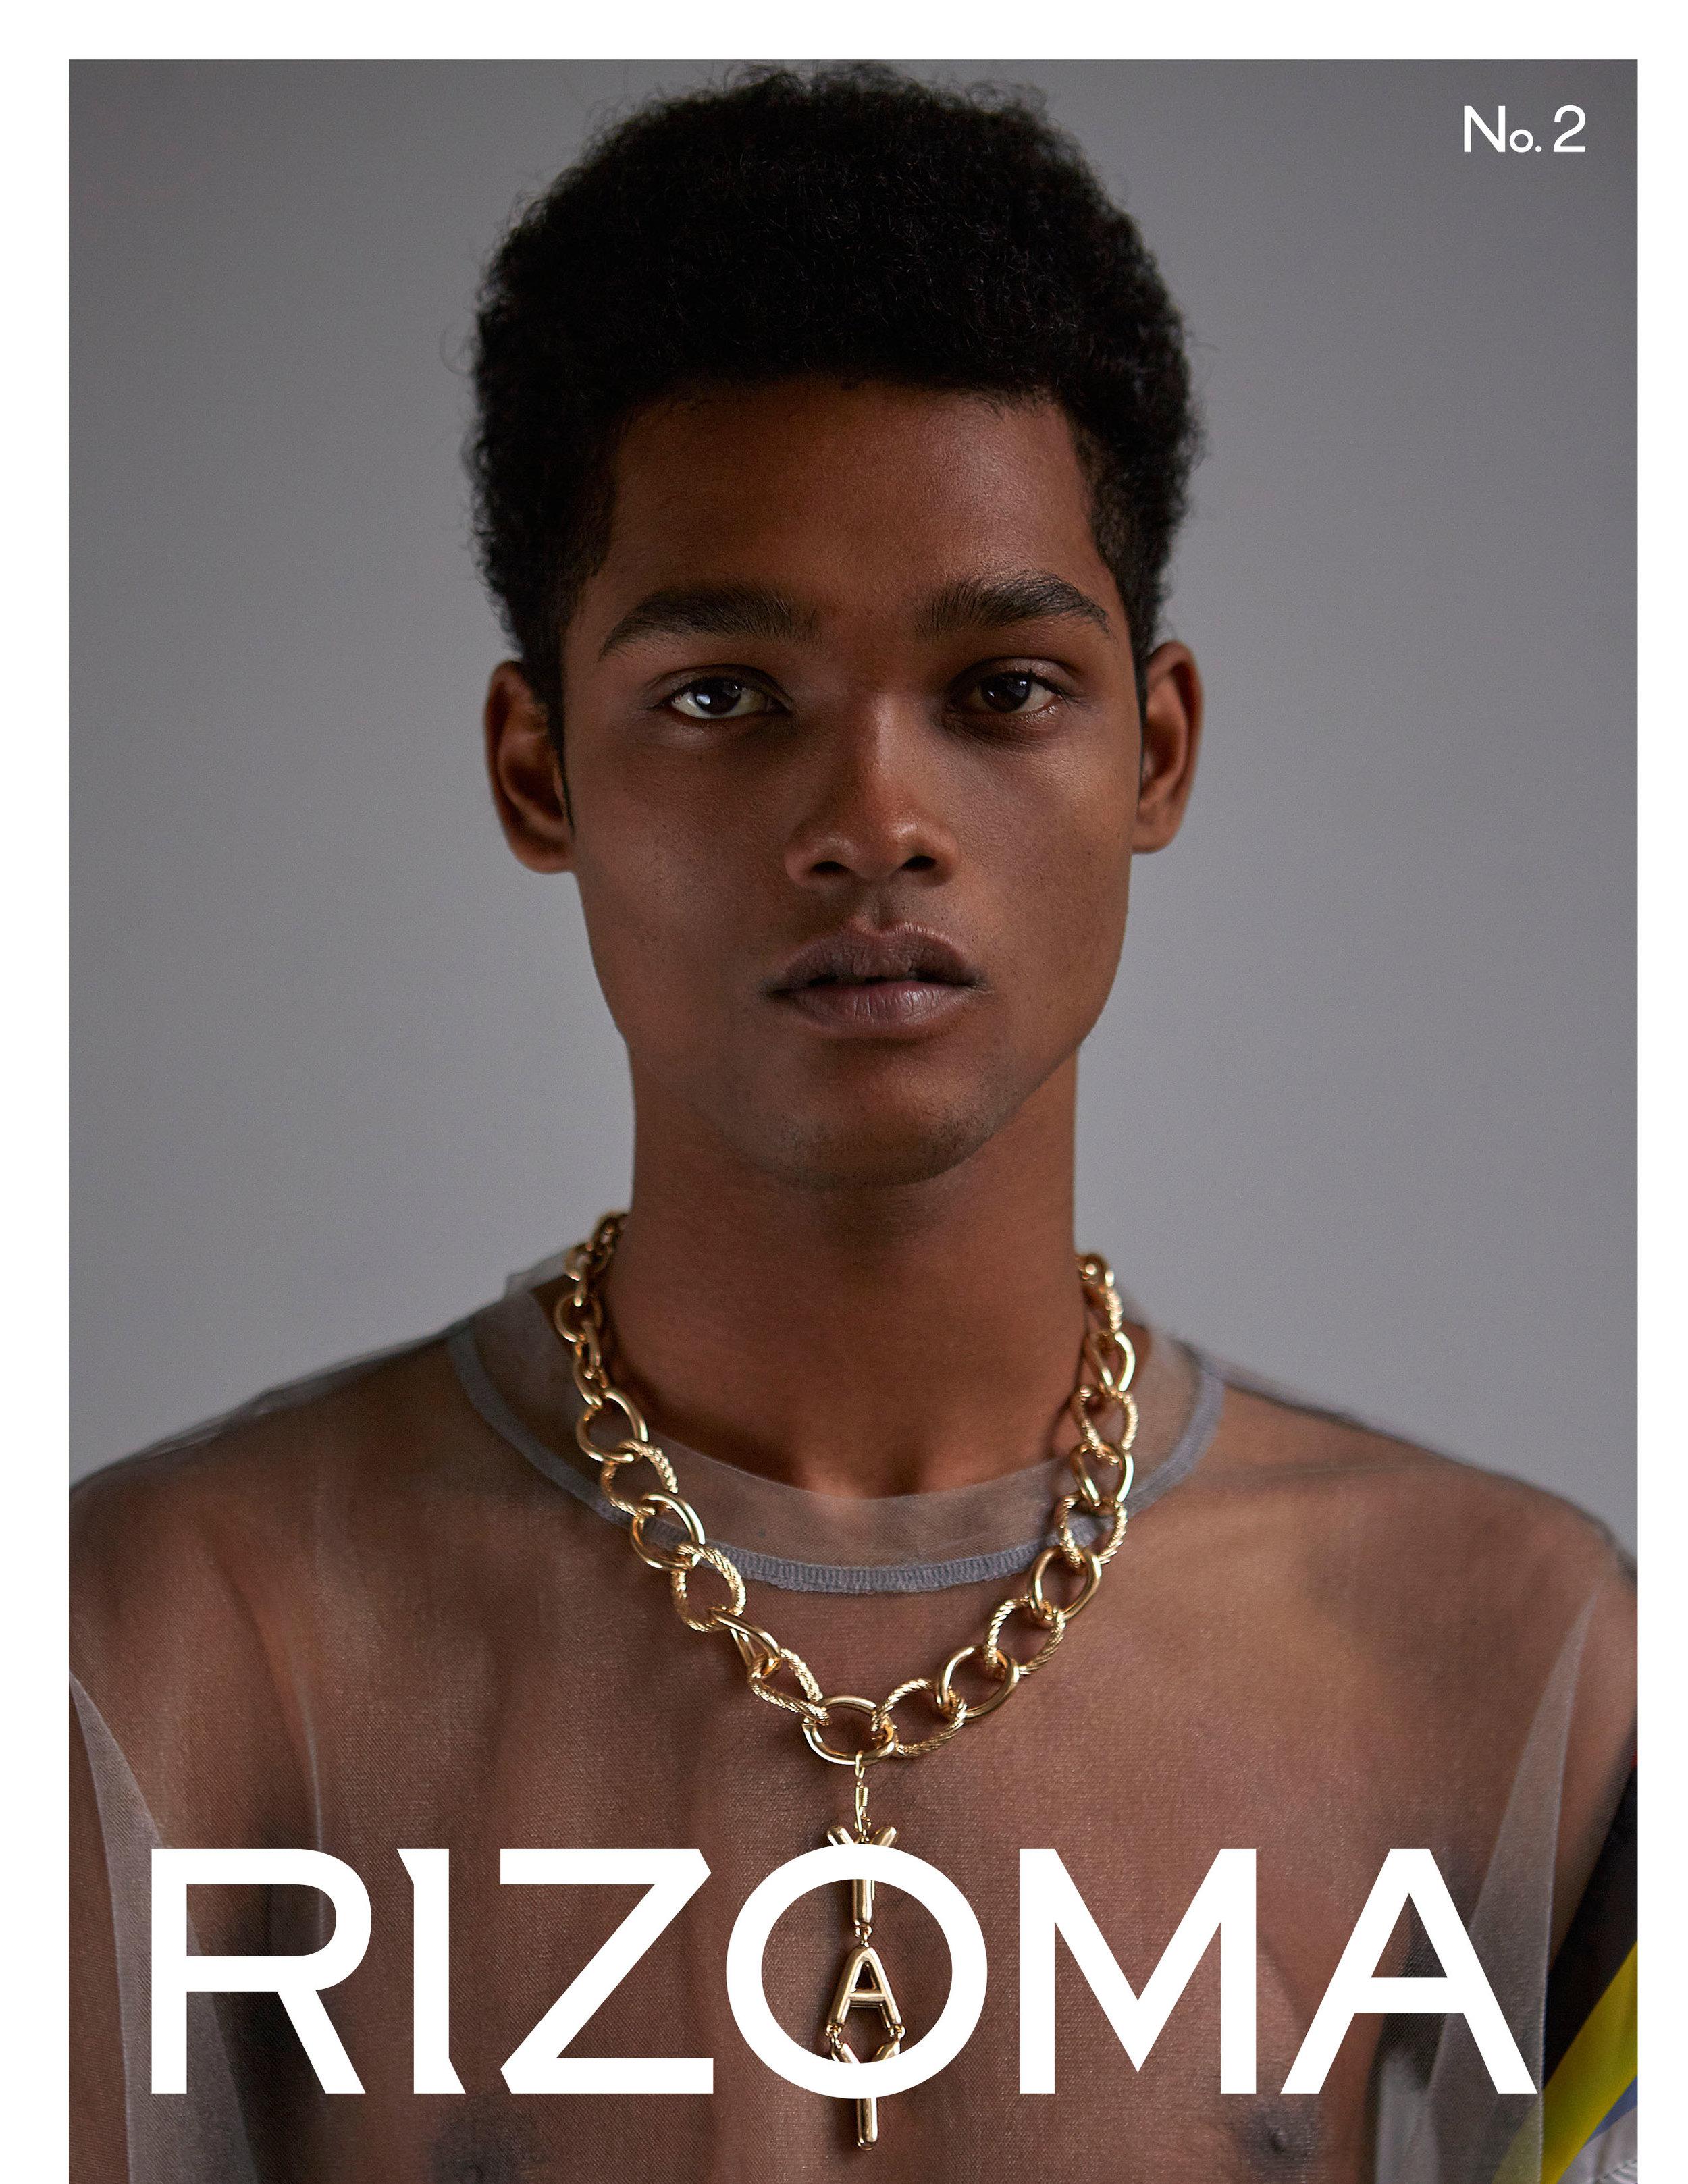 1Q3RHIZOME-COVER-TEMPLATE 3.21.15 PM.jpg